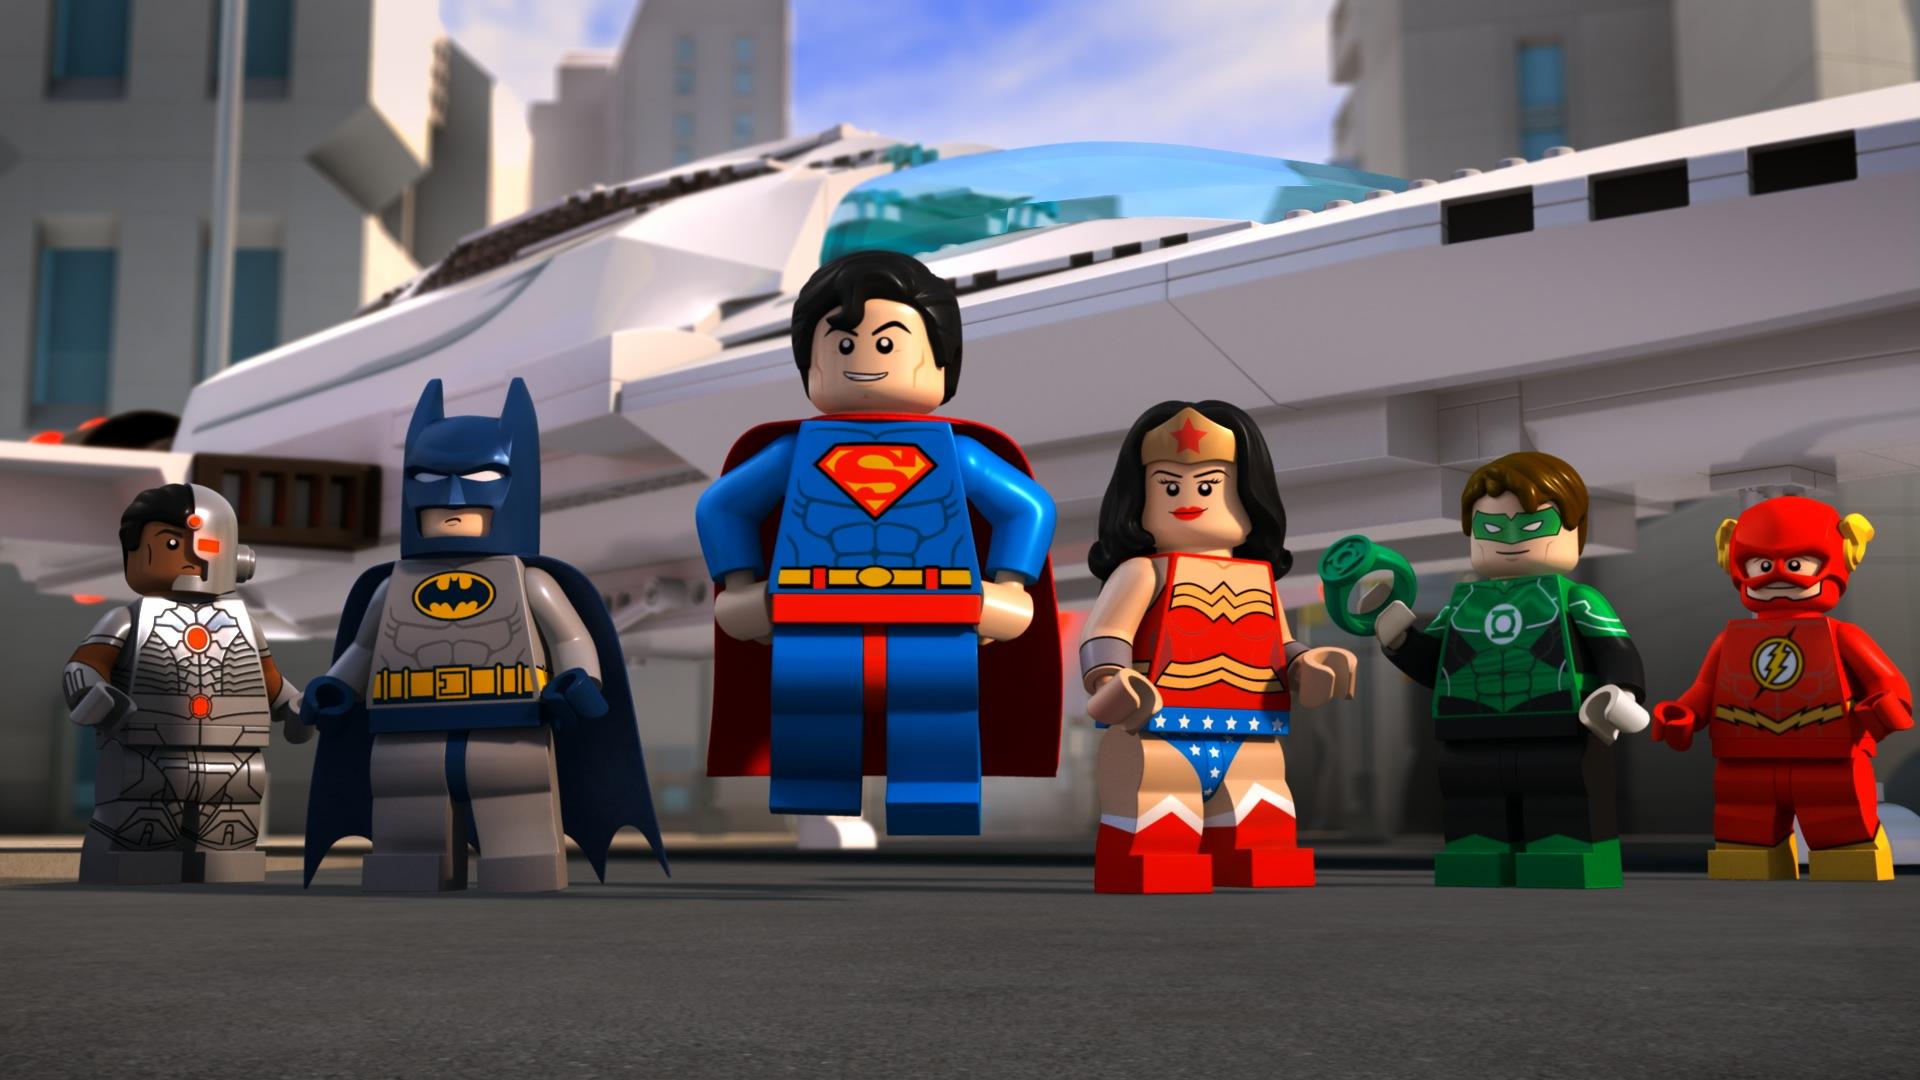 The Batman Universe – WB Animation at SDCC 2015